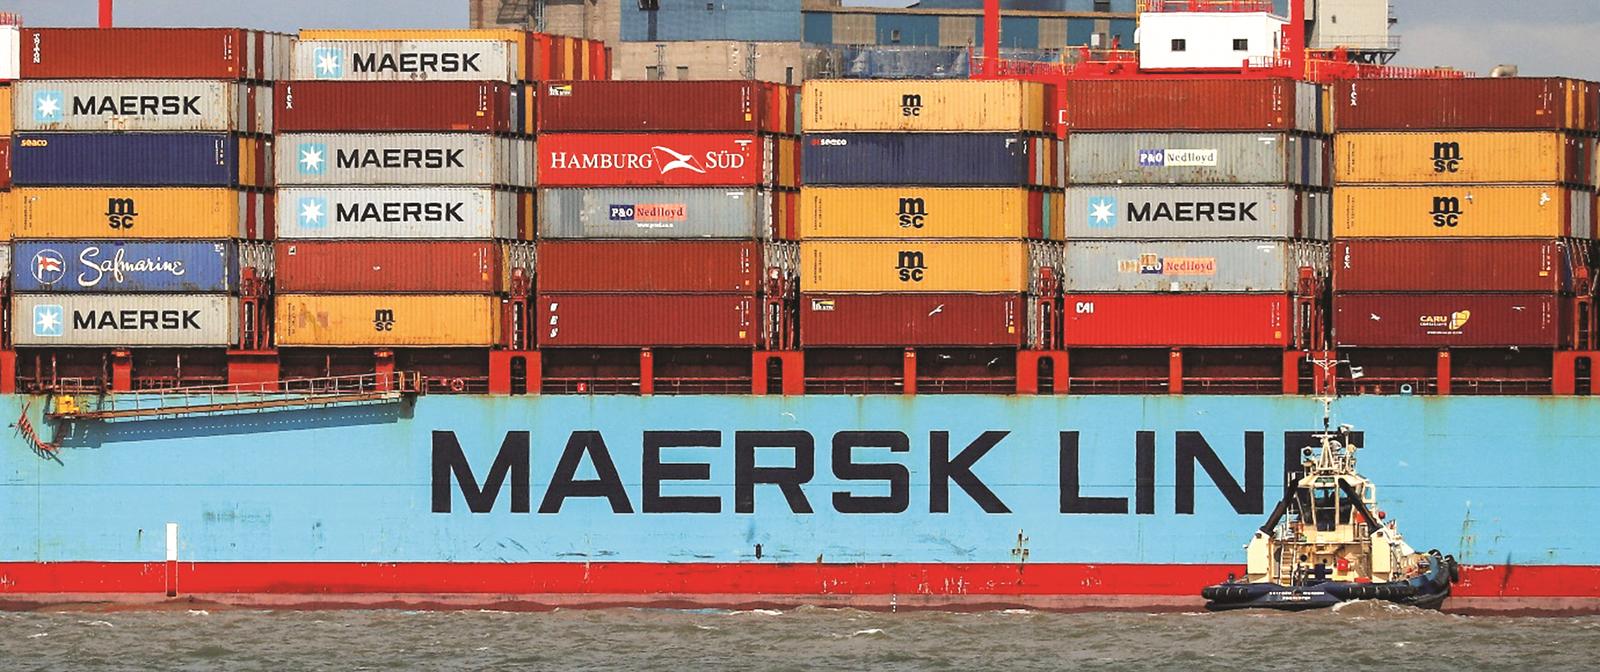 Chuỗi cung ứng toàn cầu bị đe dọa bởi virus corona